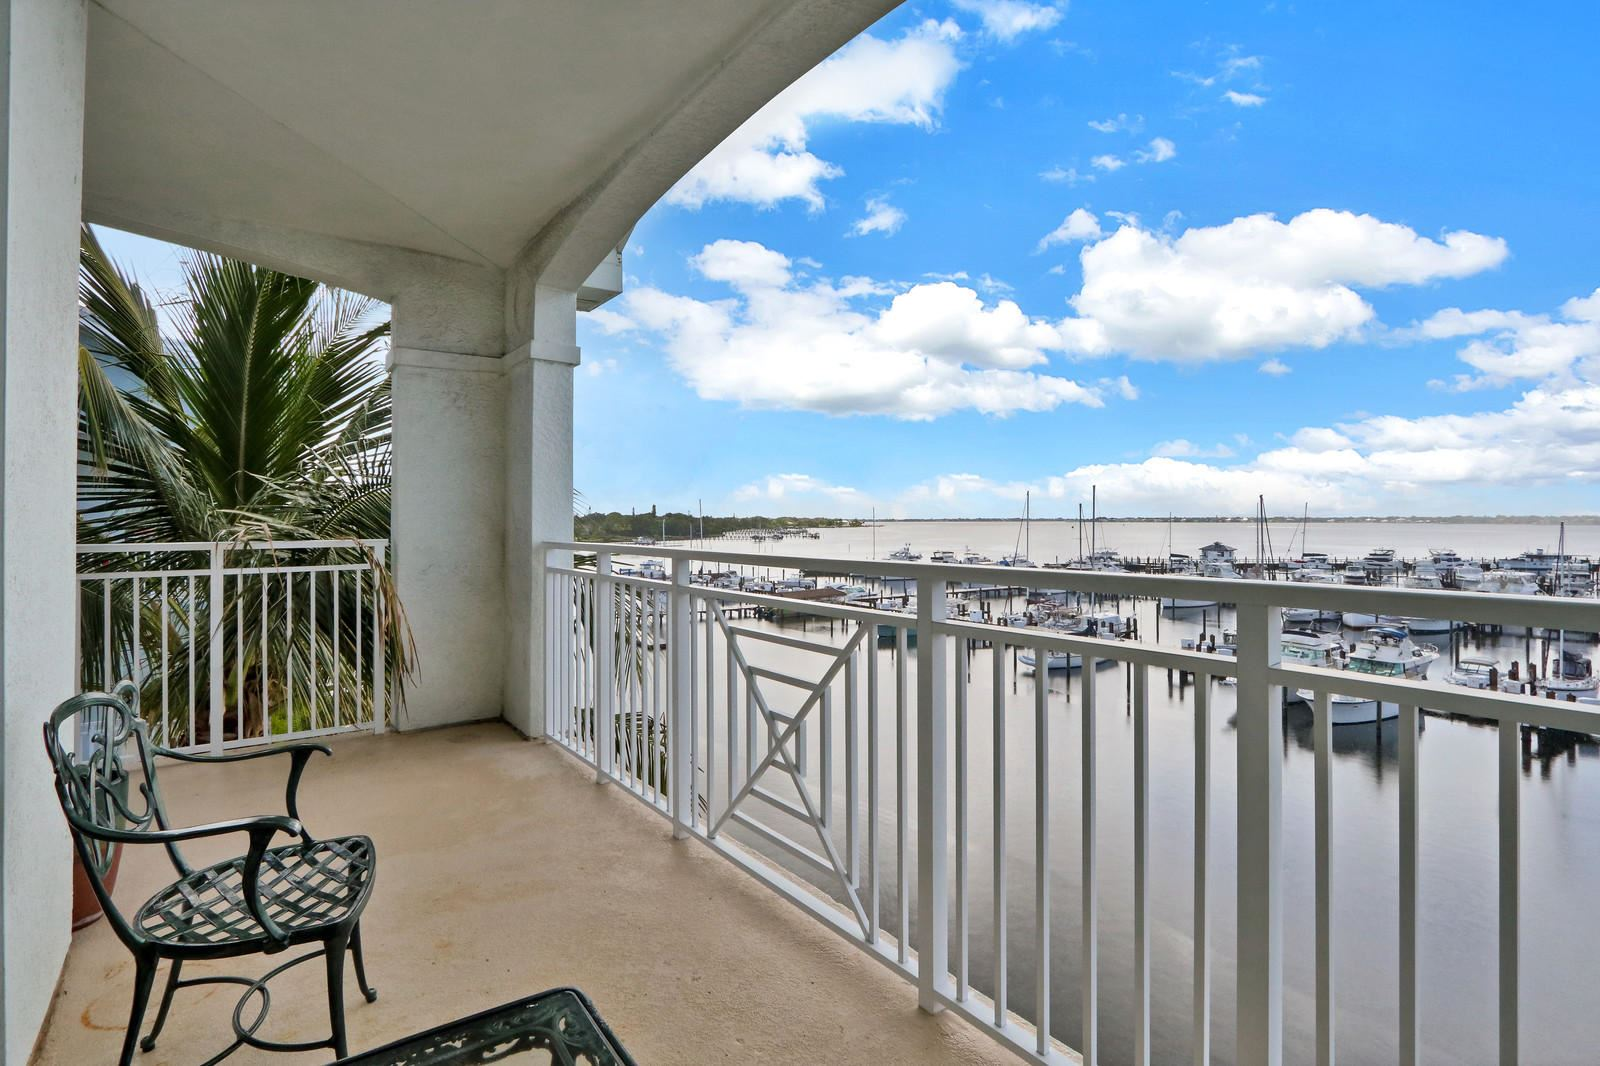 815 NW Flagler Avenue #403, Stuart, FL 34994 - #: RX-10623737